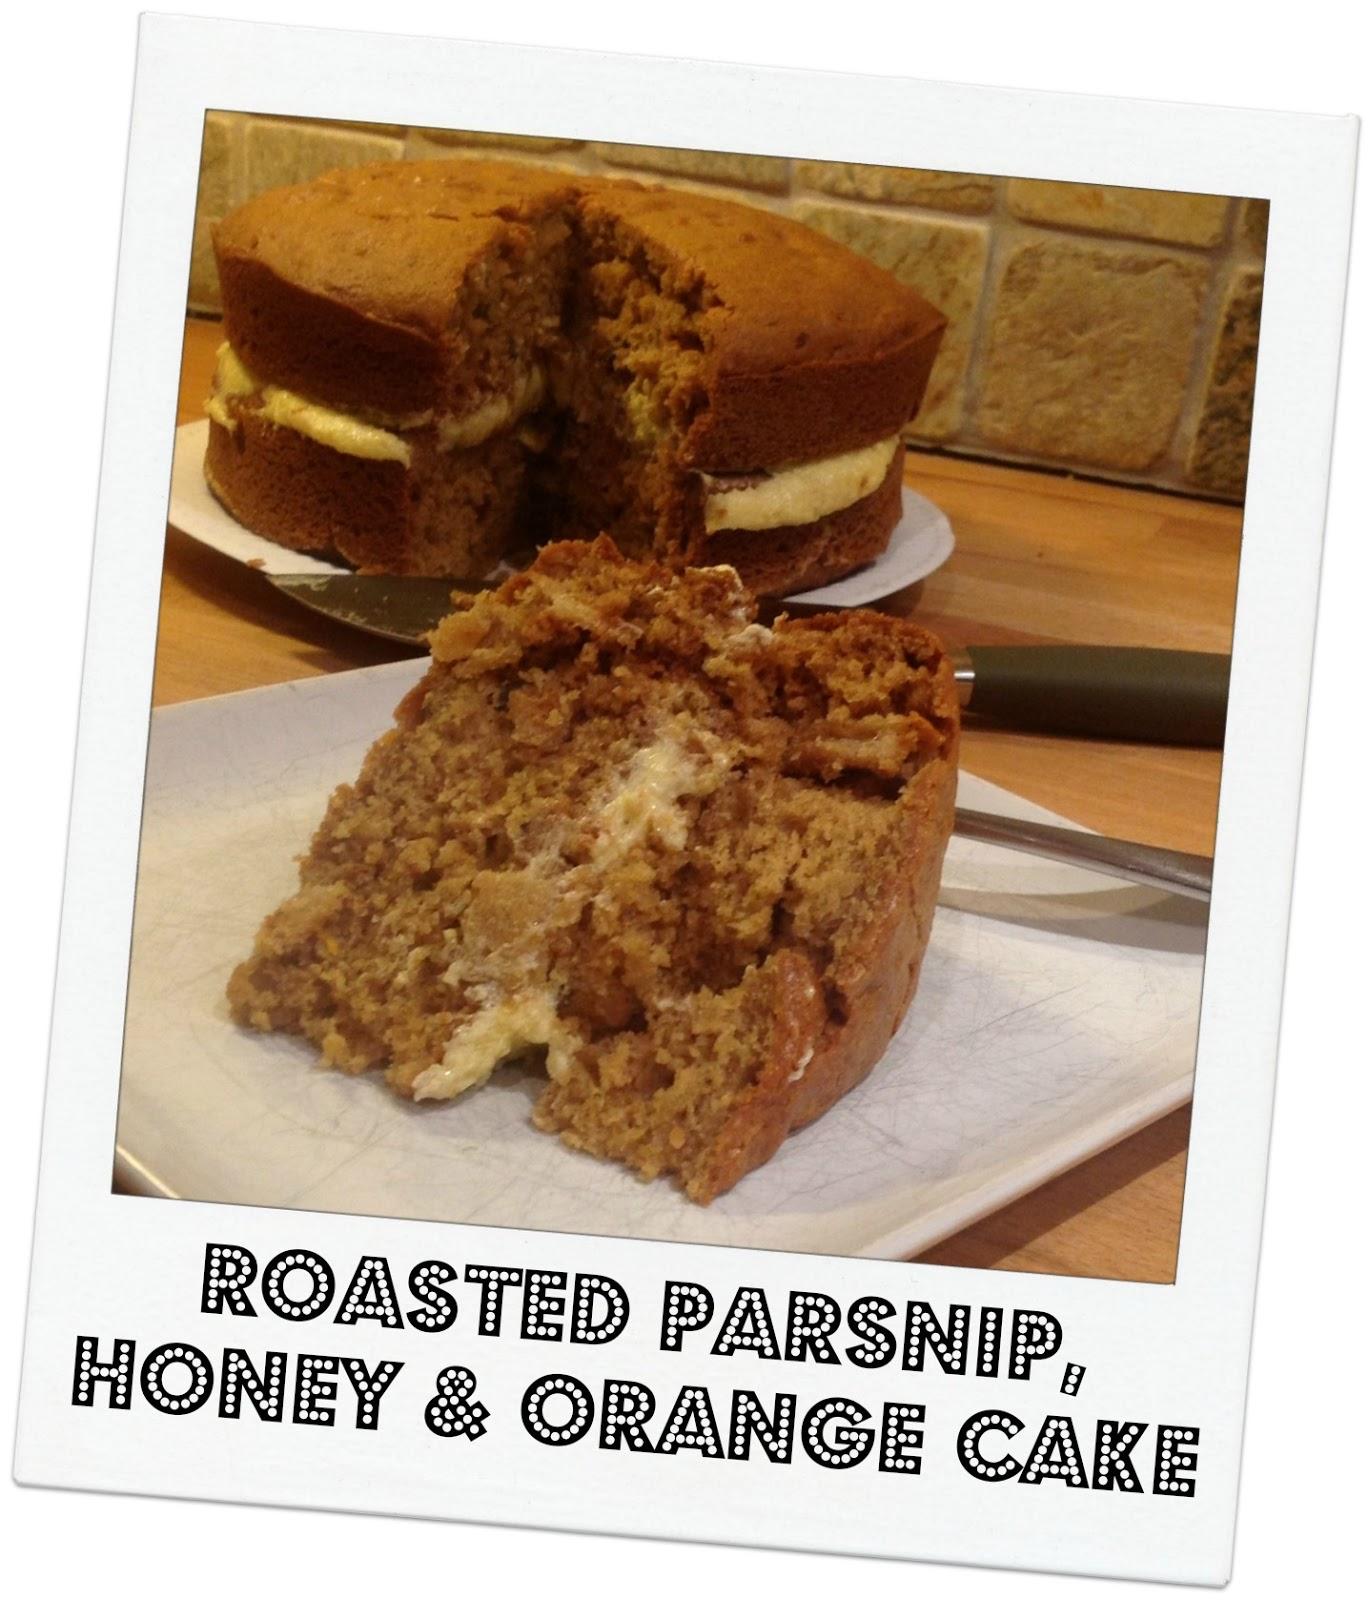 Parsnip, Honey & Orange Cake - Mummy Mishaps